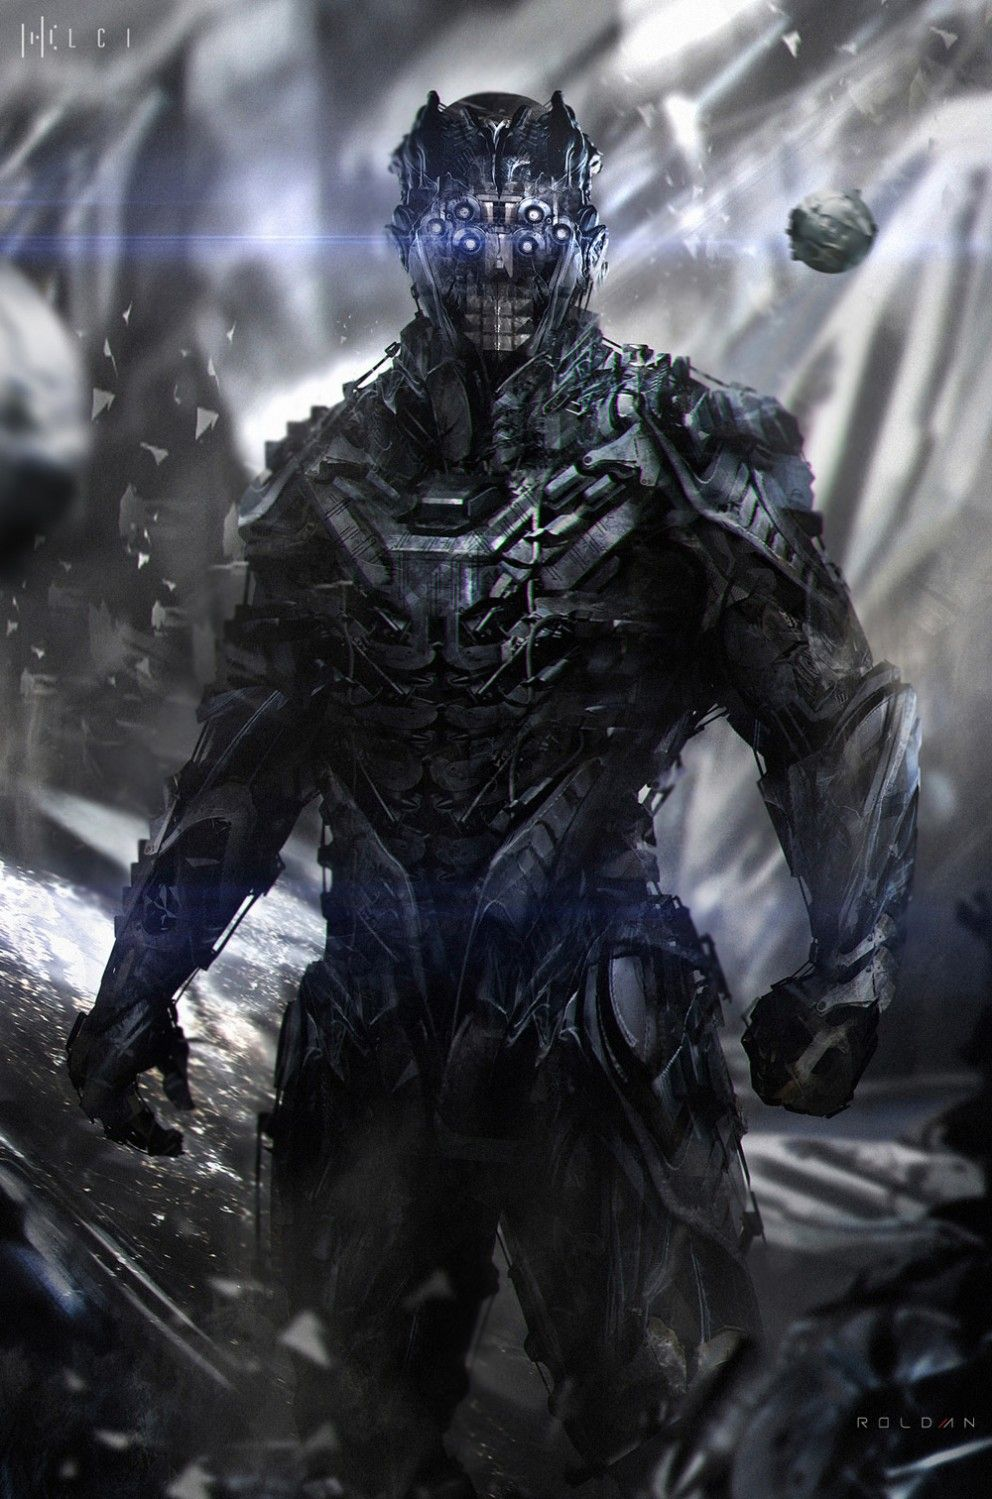 sci-fi art: space-soldier - 2d digital, sci-ficoolvibe – digital